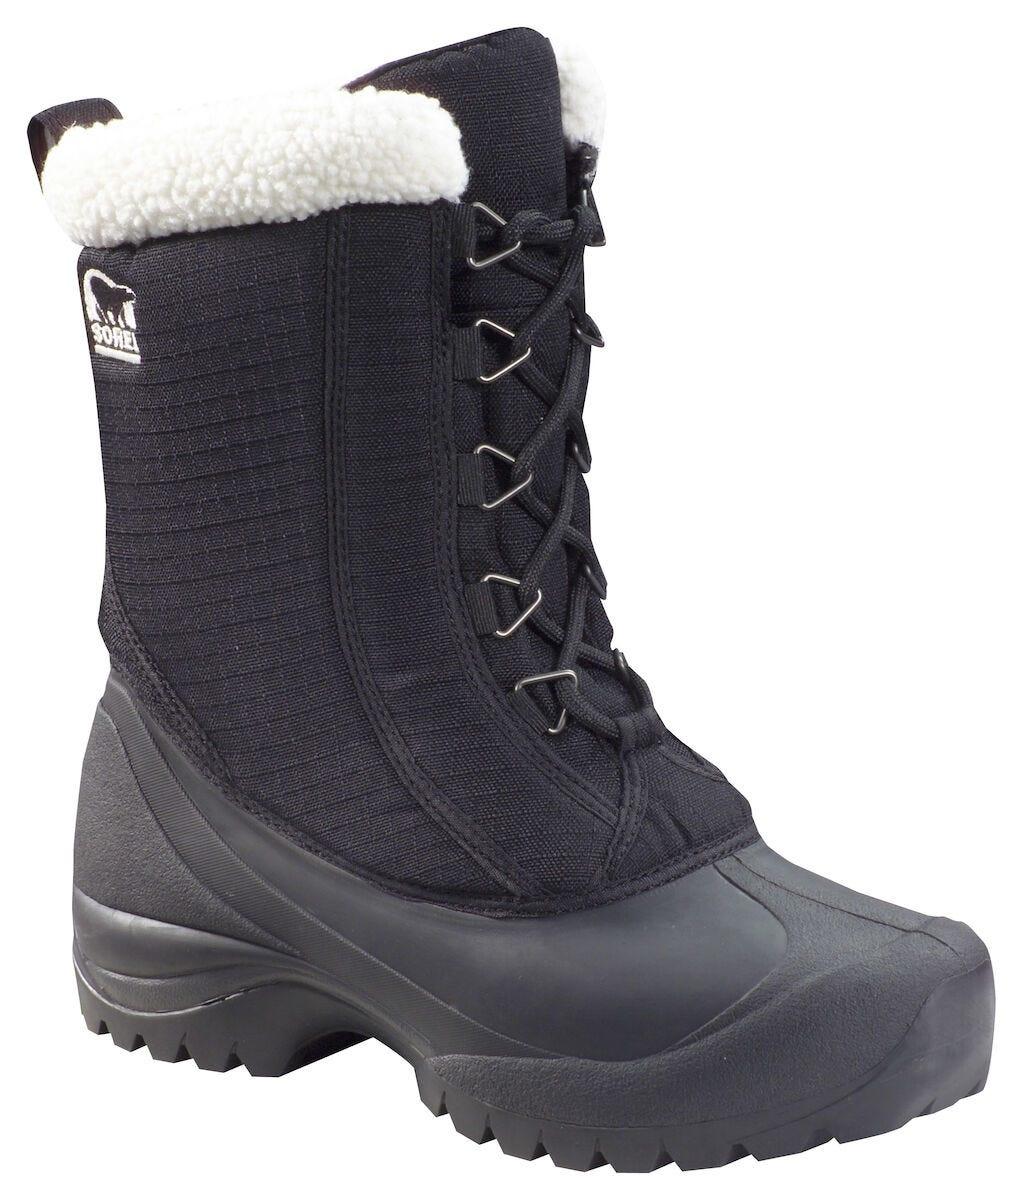 Sorel Cumberland Women's Winter Boot - Size 5.5